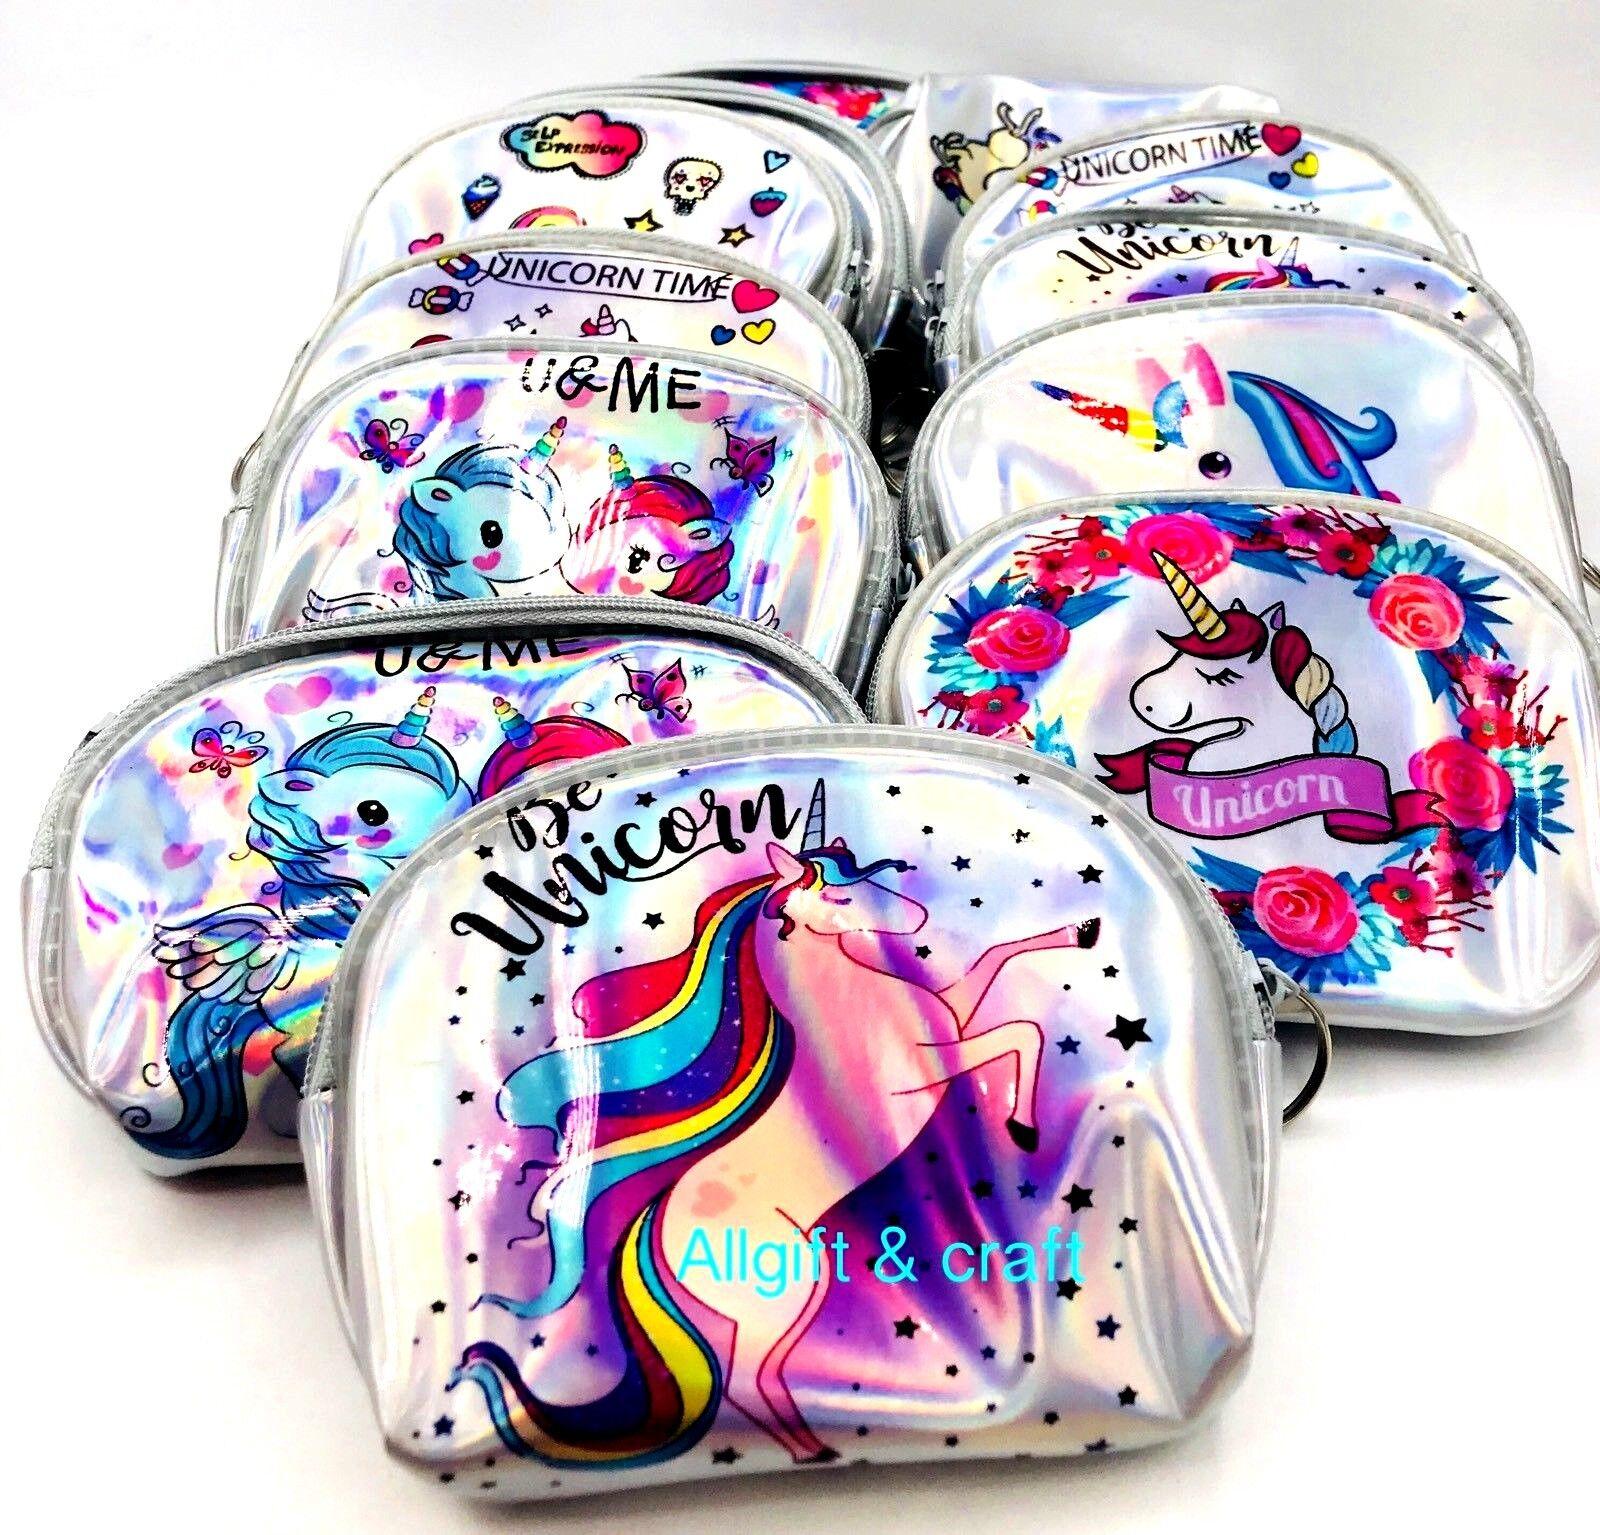 12pcs lot Unicorn Theme Zipper Pouch Bag Party FAVORS Girls